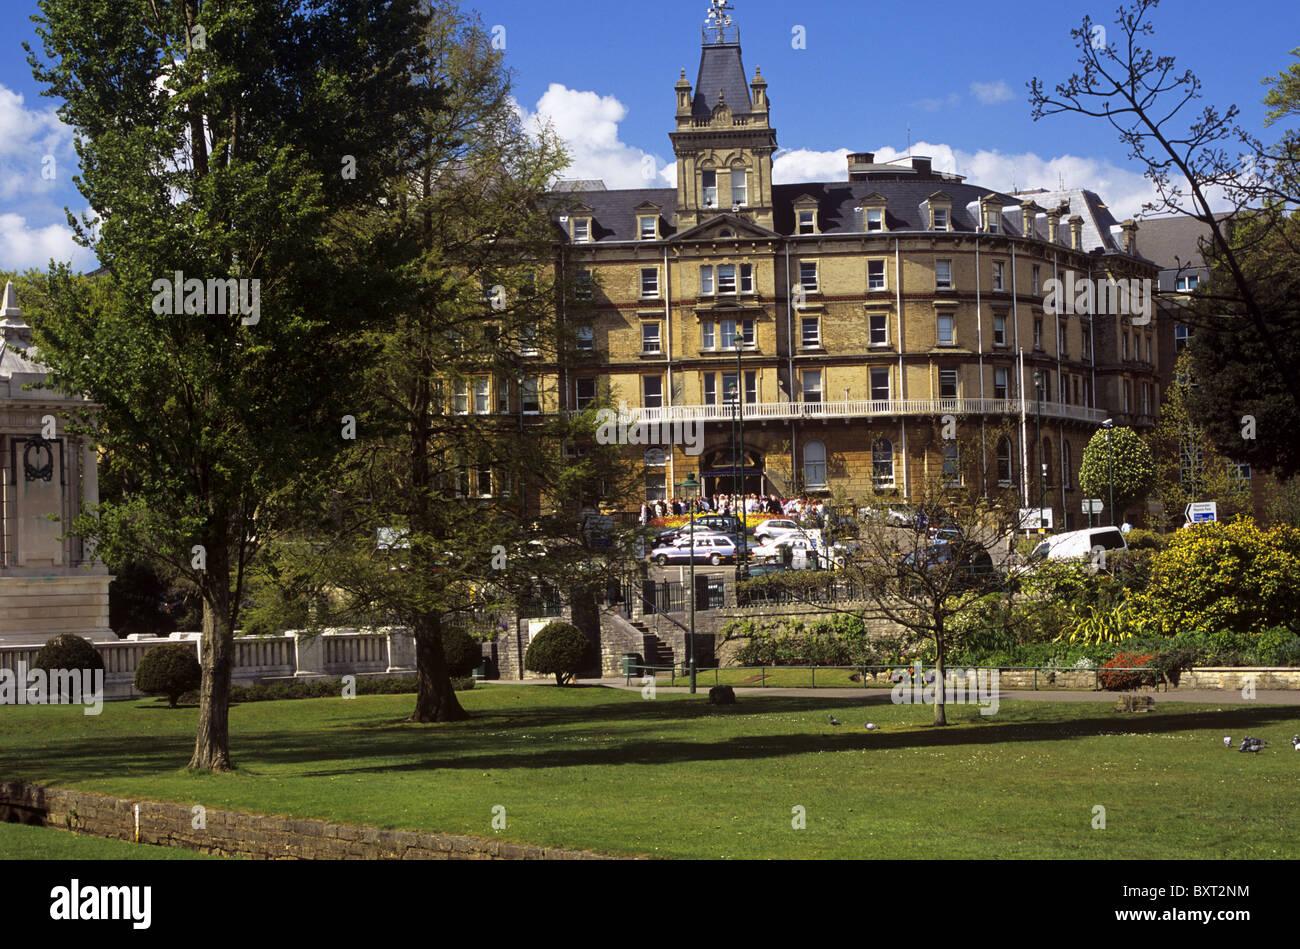 Bournemouth Town Hall Gardens Stock Photos & Bournemouth Town Hall ...